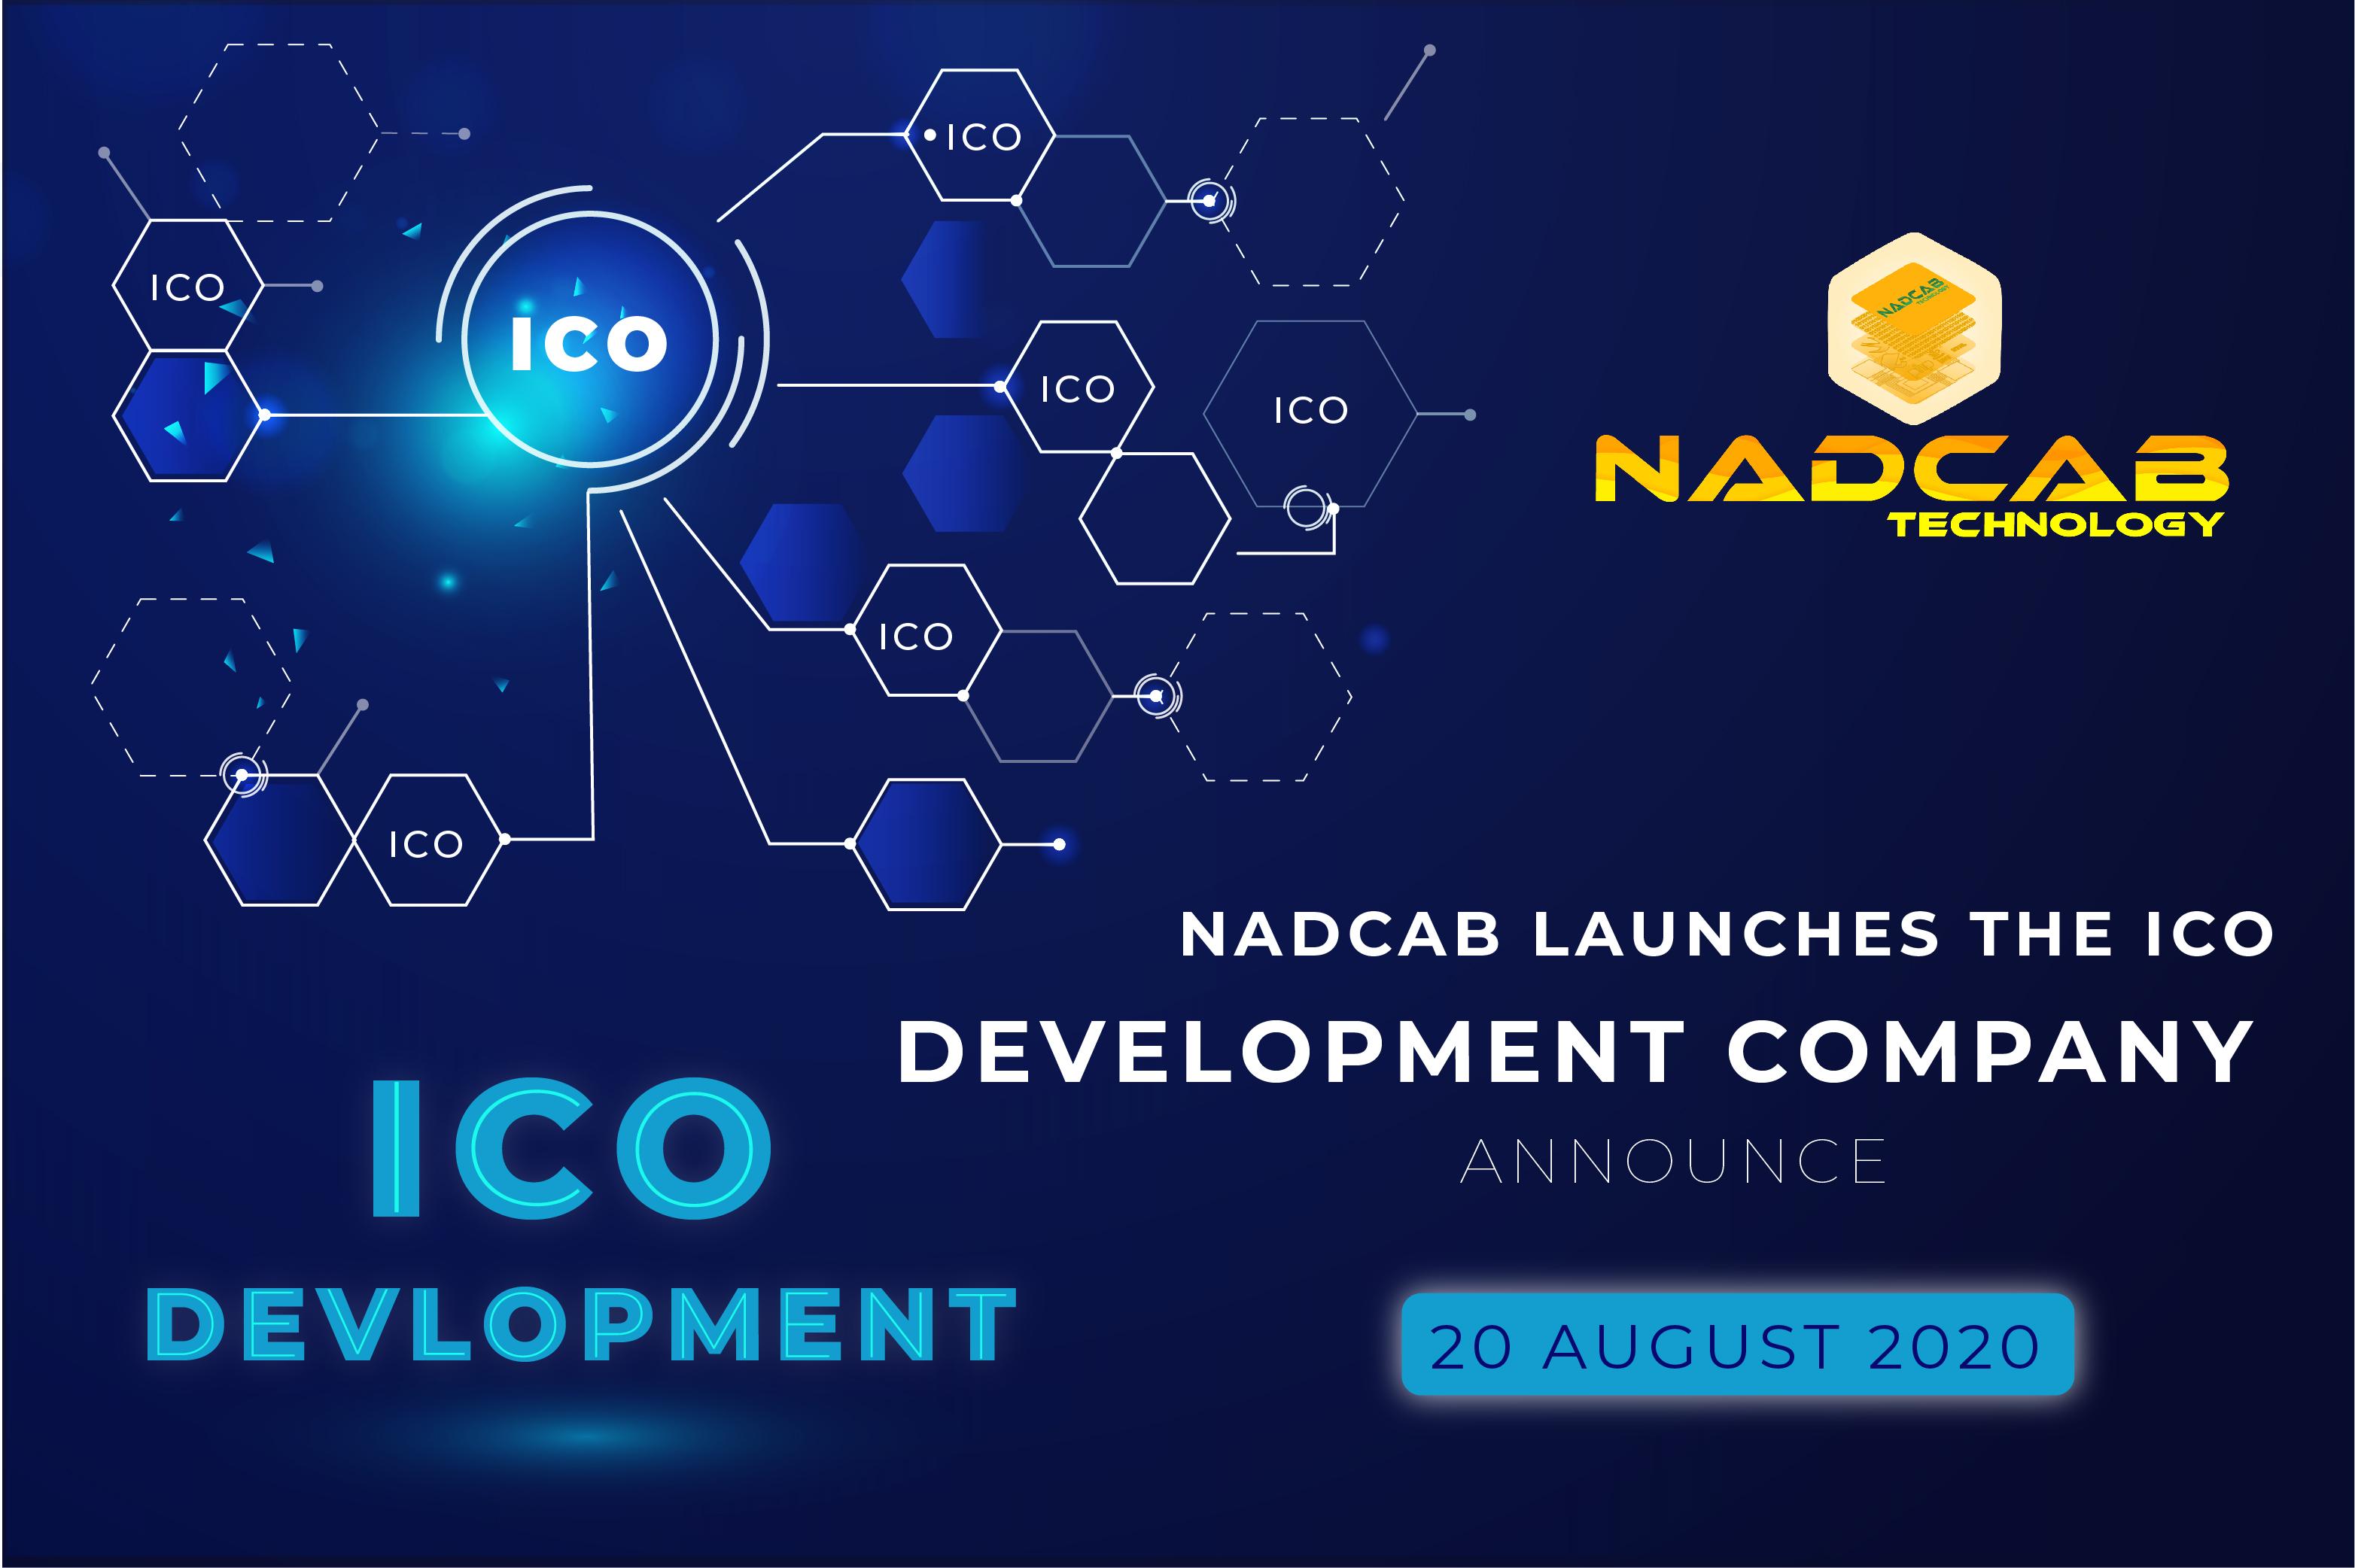 nadcab-launches-the-ico-development-company-20aug